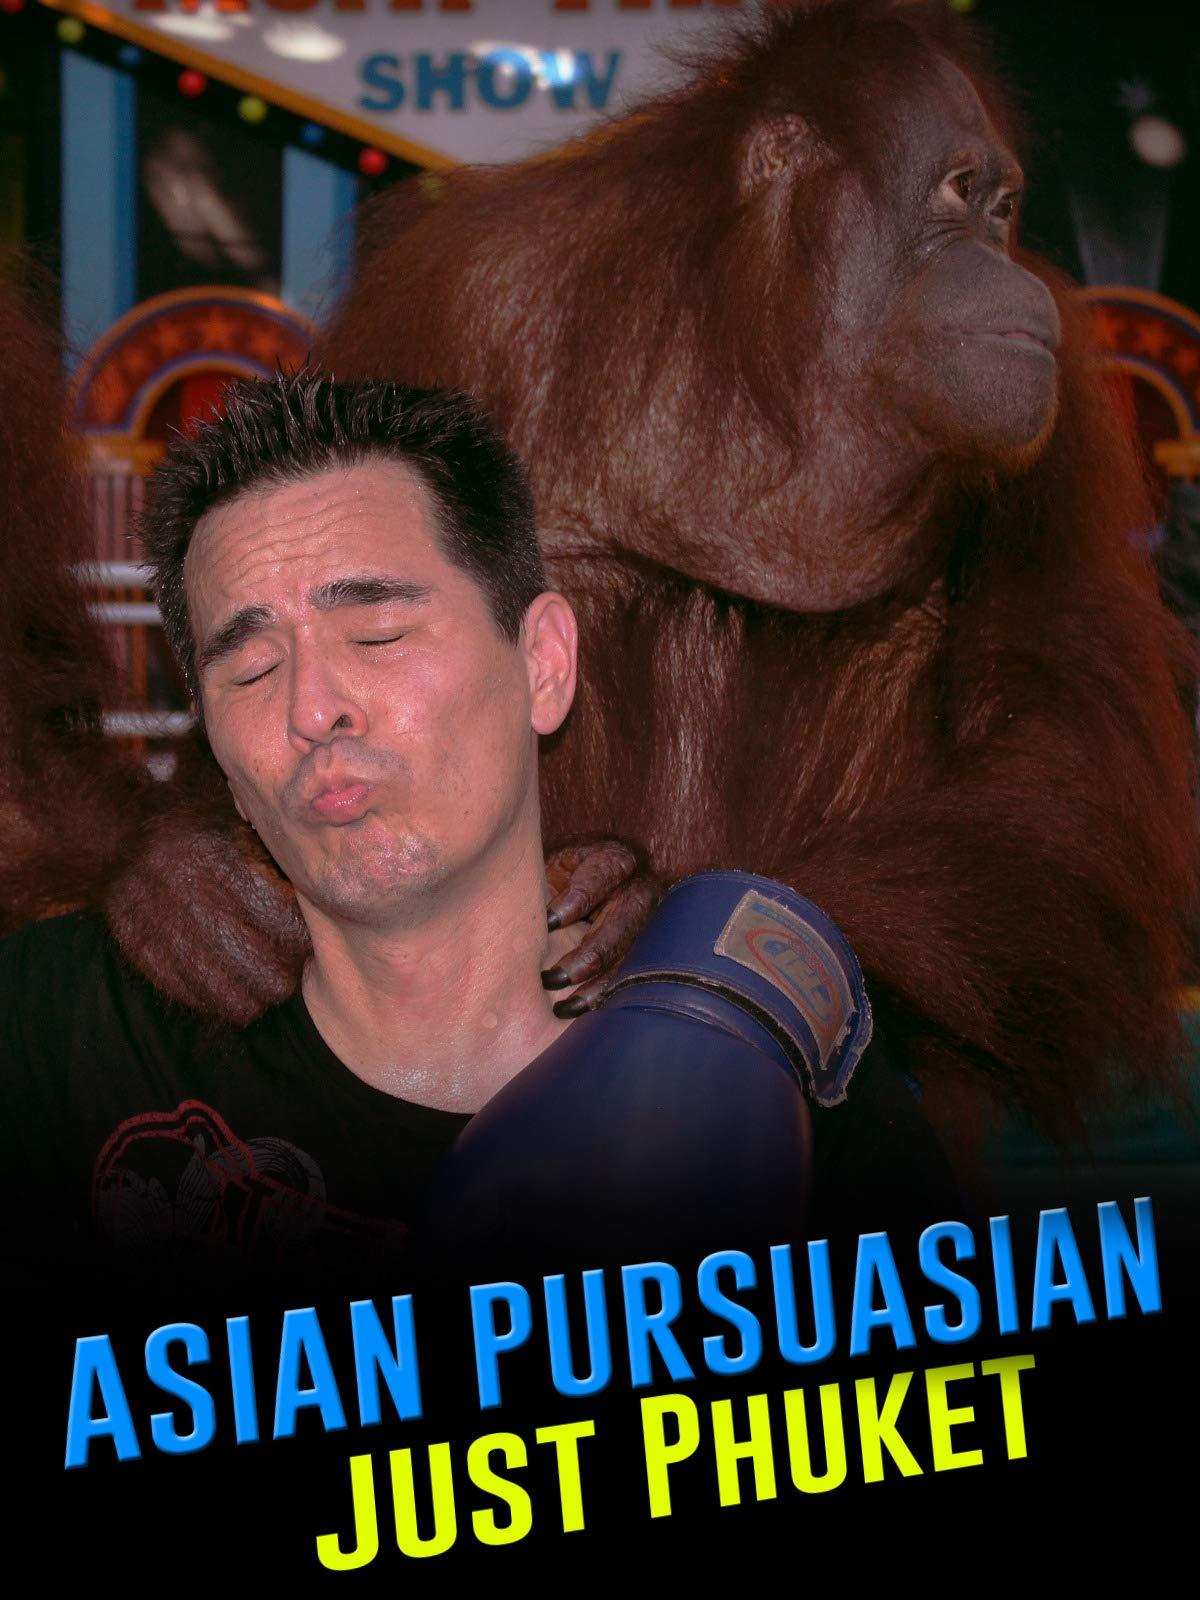 Asian Pursuasian Just Phuket